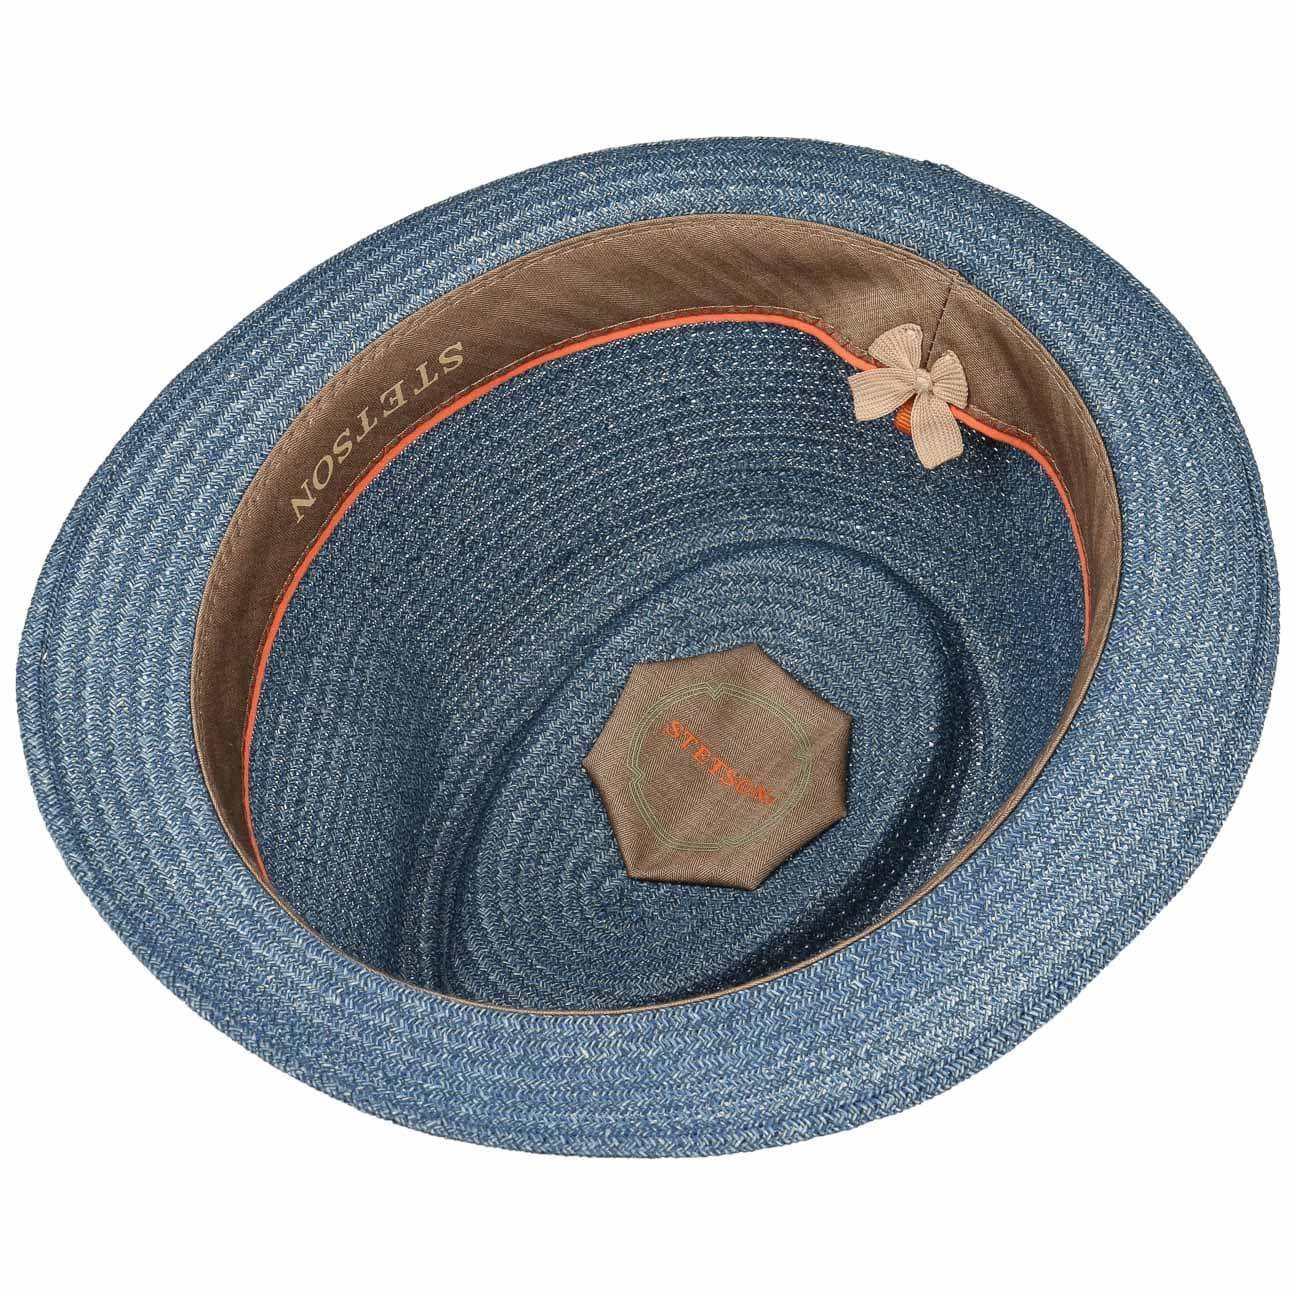 2e8abd5a66e ... Selden Toyo Trilby Straw Hat by Stetson - blue 3 ...